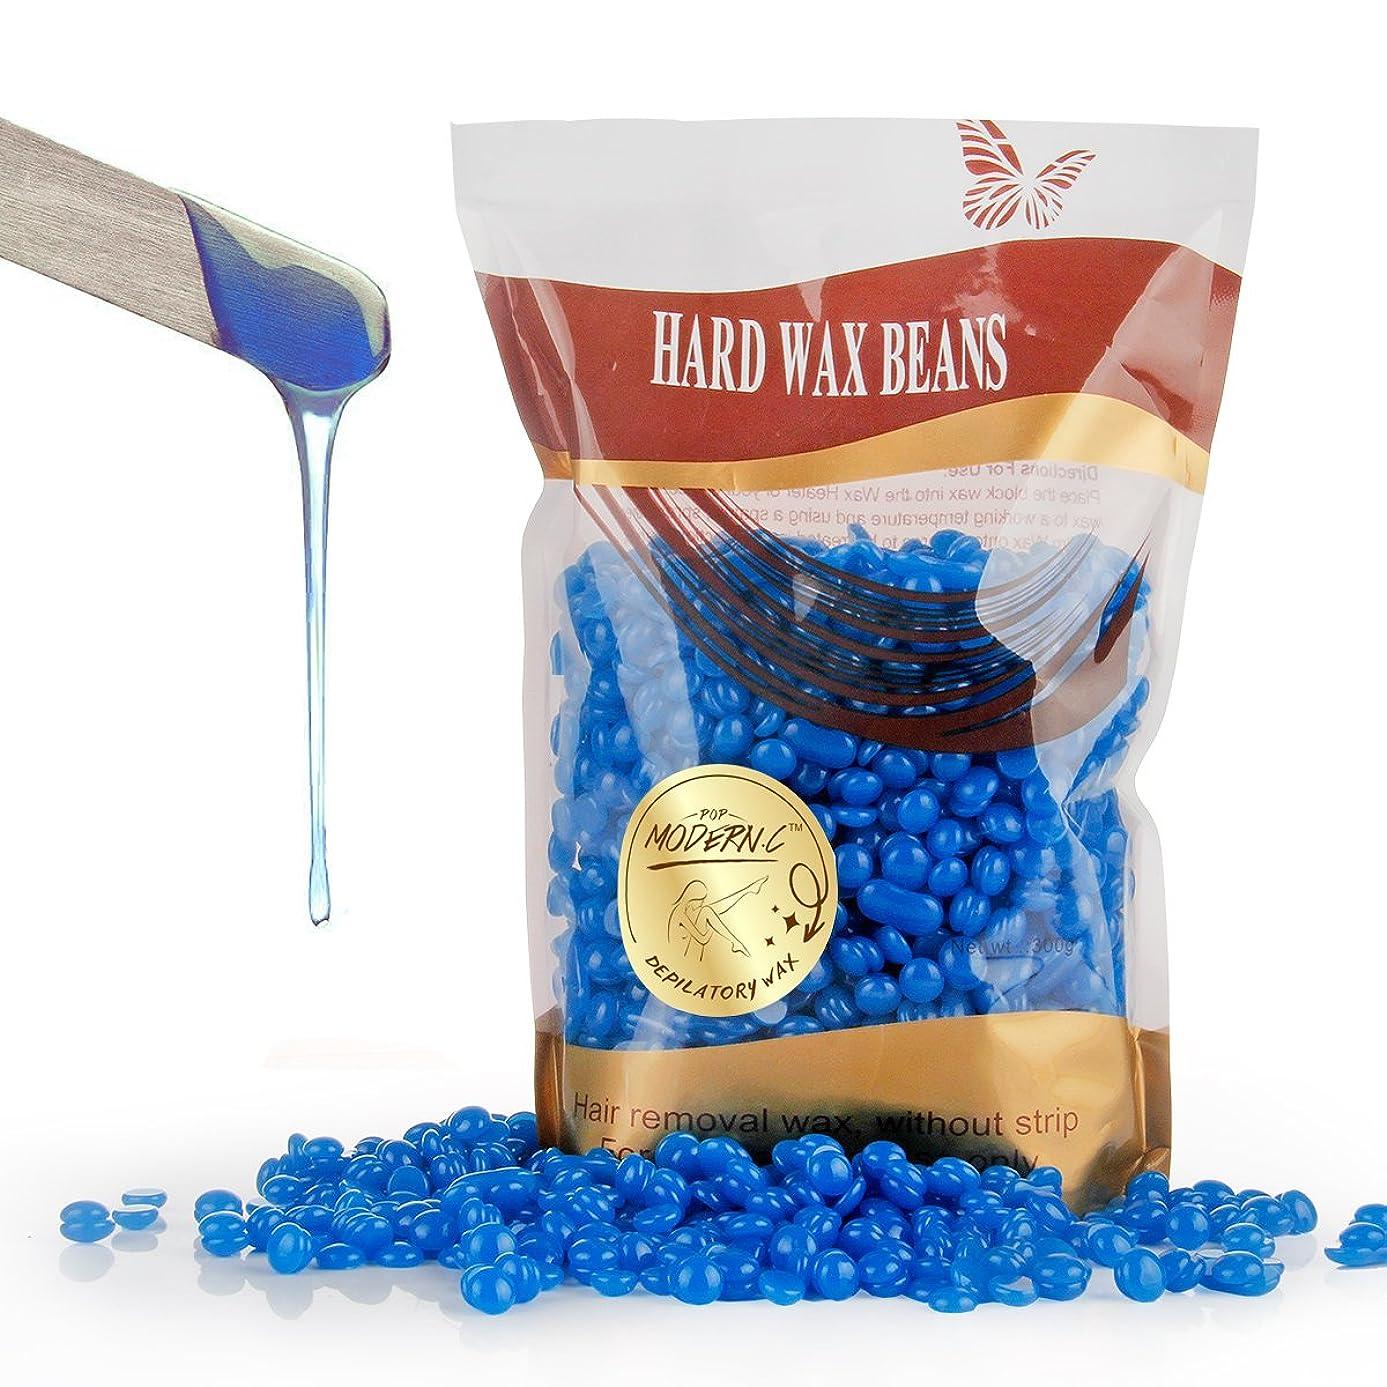 Wax Bean Hair Removal Brazilian Pearl Depilatory Waxing Beads for Men Women Chest Face Body Bikini Arm Leg Armpits Hair Removal 300G (10.6oz)(Chamomile)